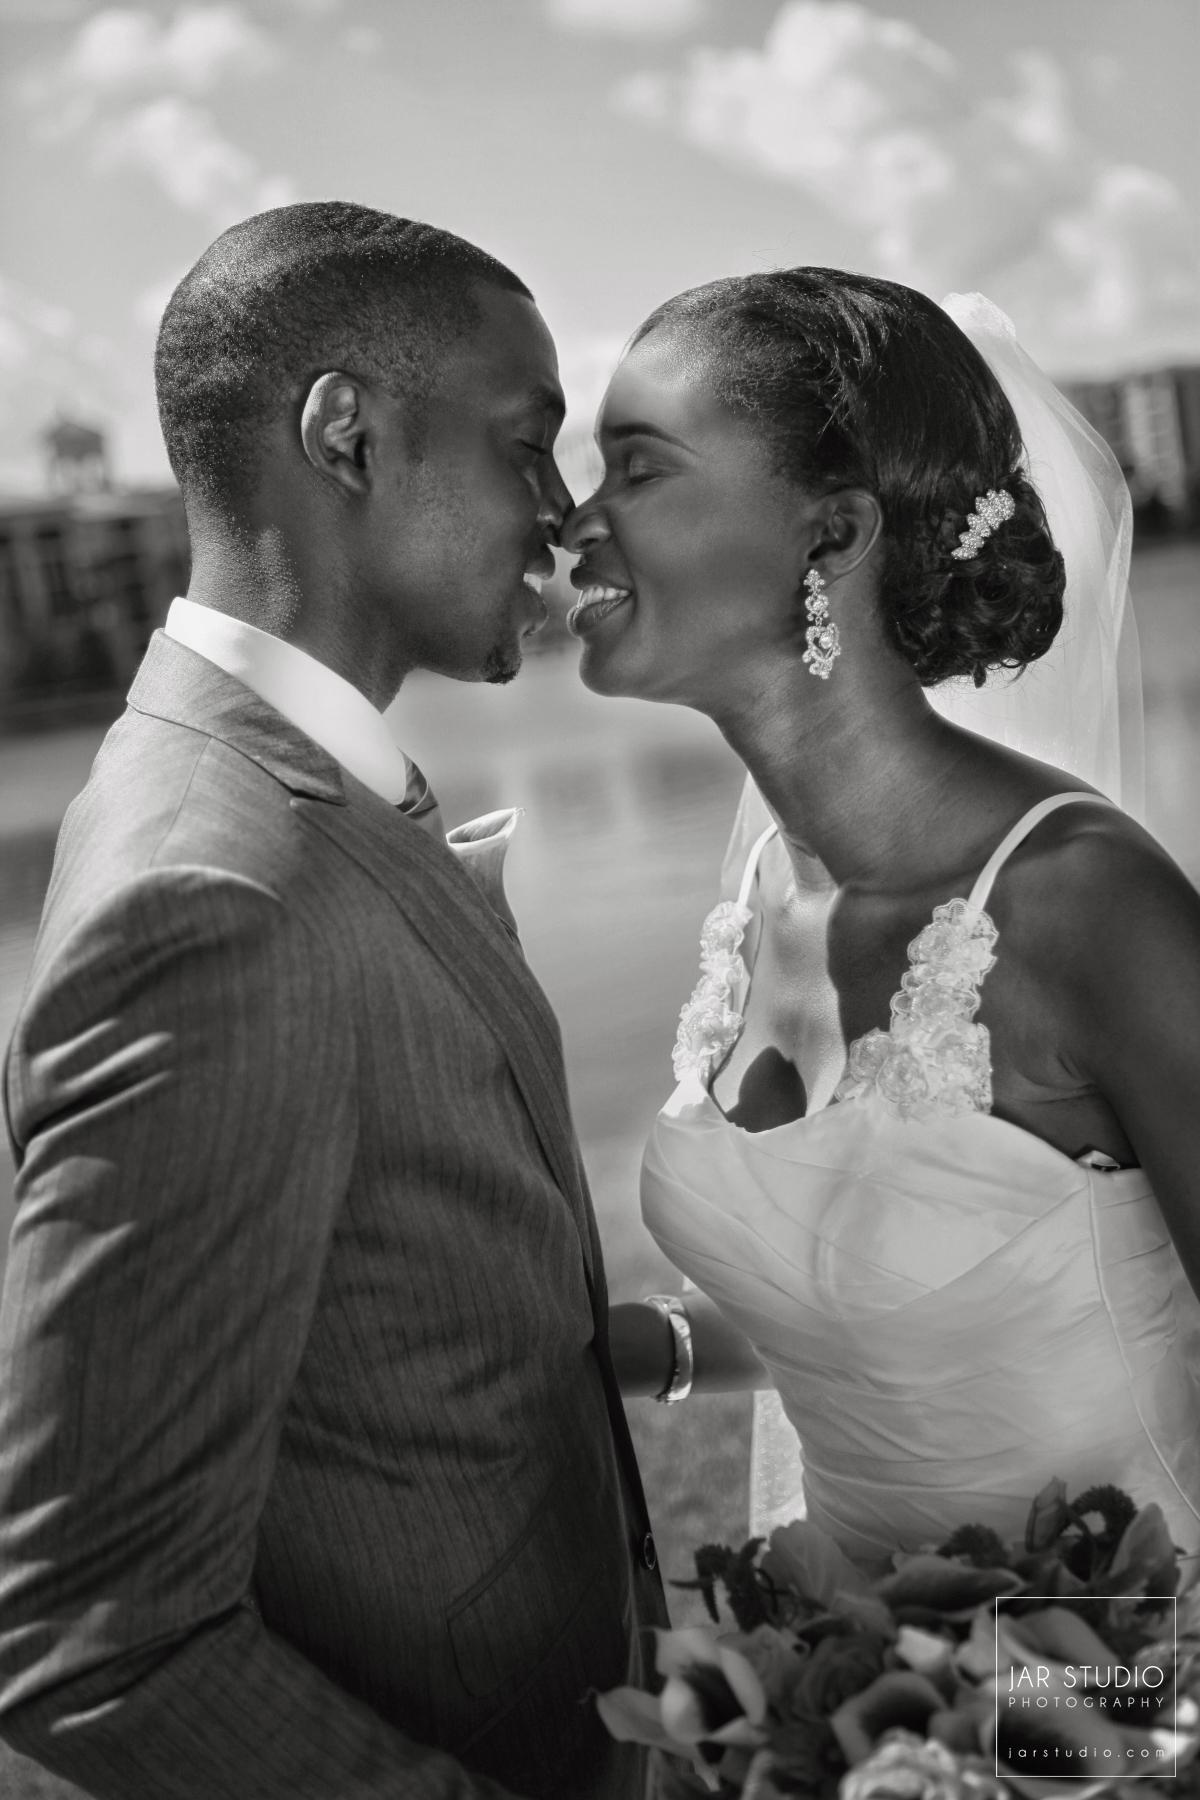 19-romantic-modern-nigerian-morning-wedding-jarstudio-photographer.JPG